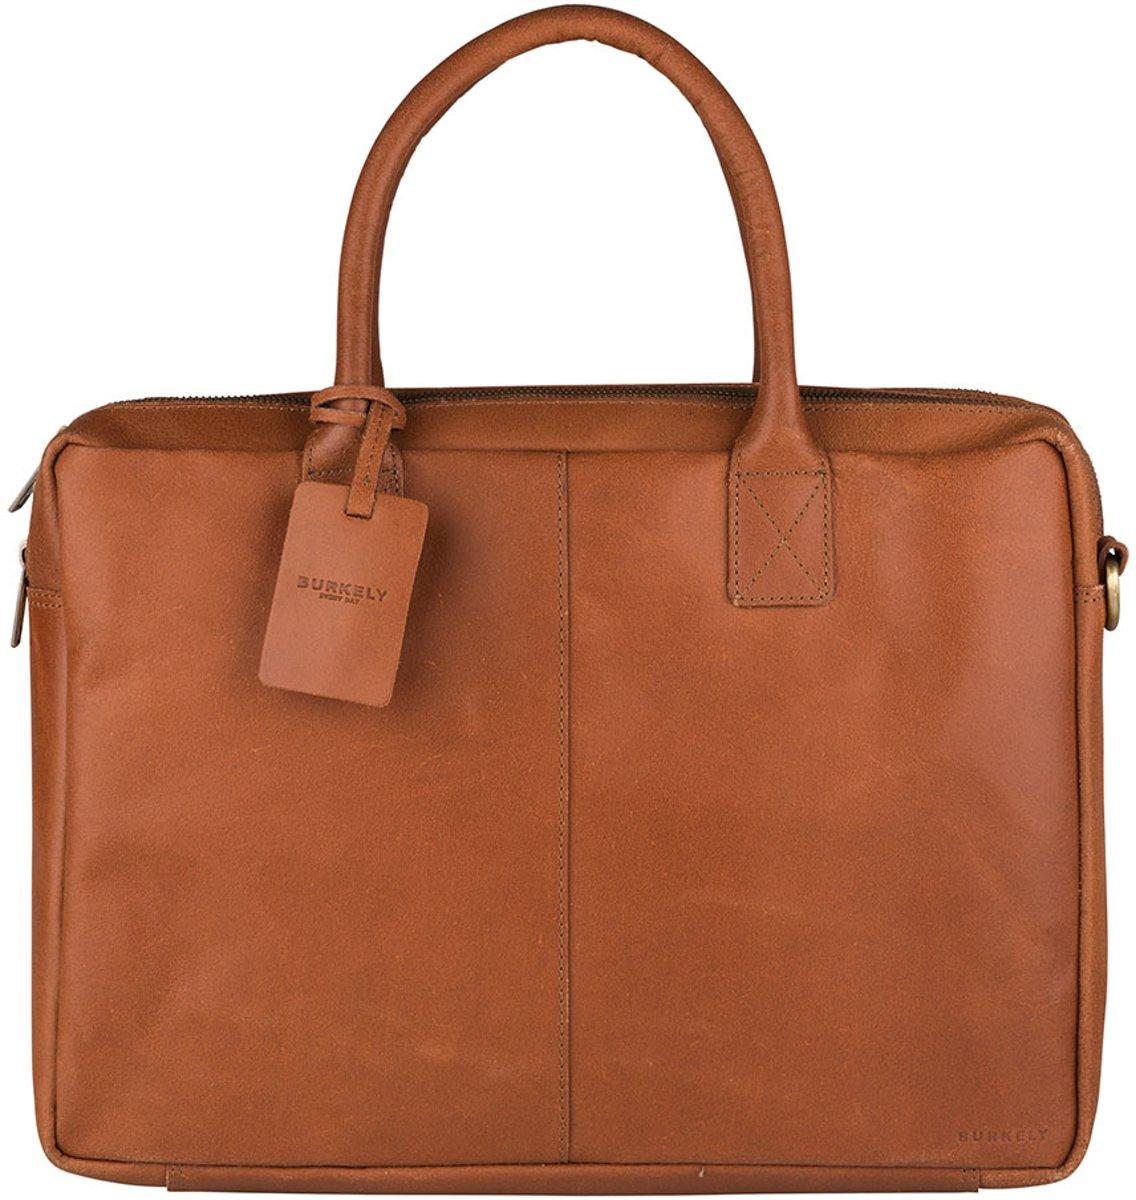 aafe41b7ce8 bol.com   BURKELY VINTAGE TAYLOR WORKER laptoptas 15.6 inch - Cognac